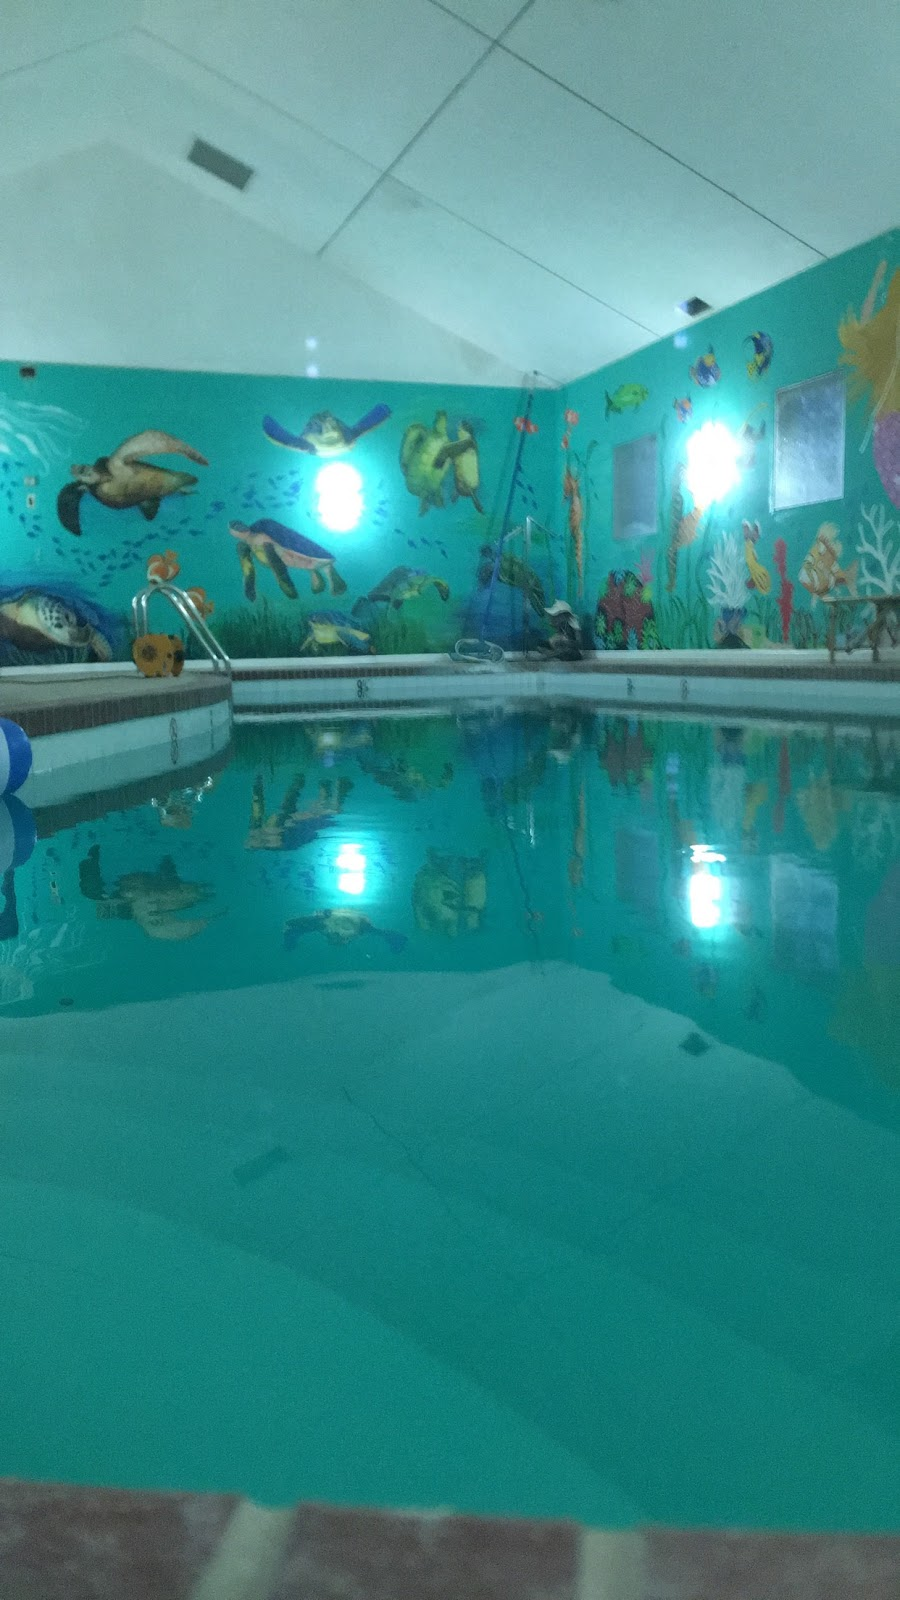 Berry Scuba & Swim School - travel agency  | Photo 2 of 10 | Address: 200 Northfield Rd, Northfield, IL 60093, USA | Phone: (847) 827-3100